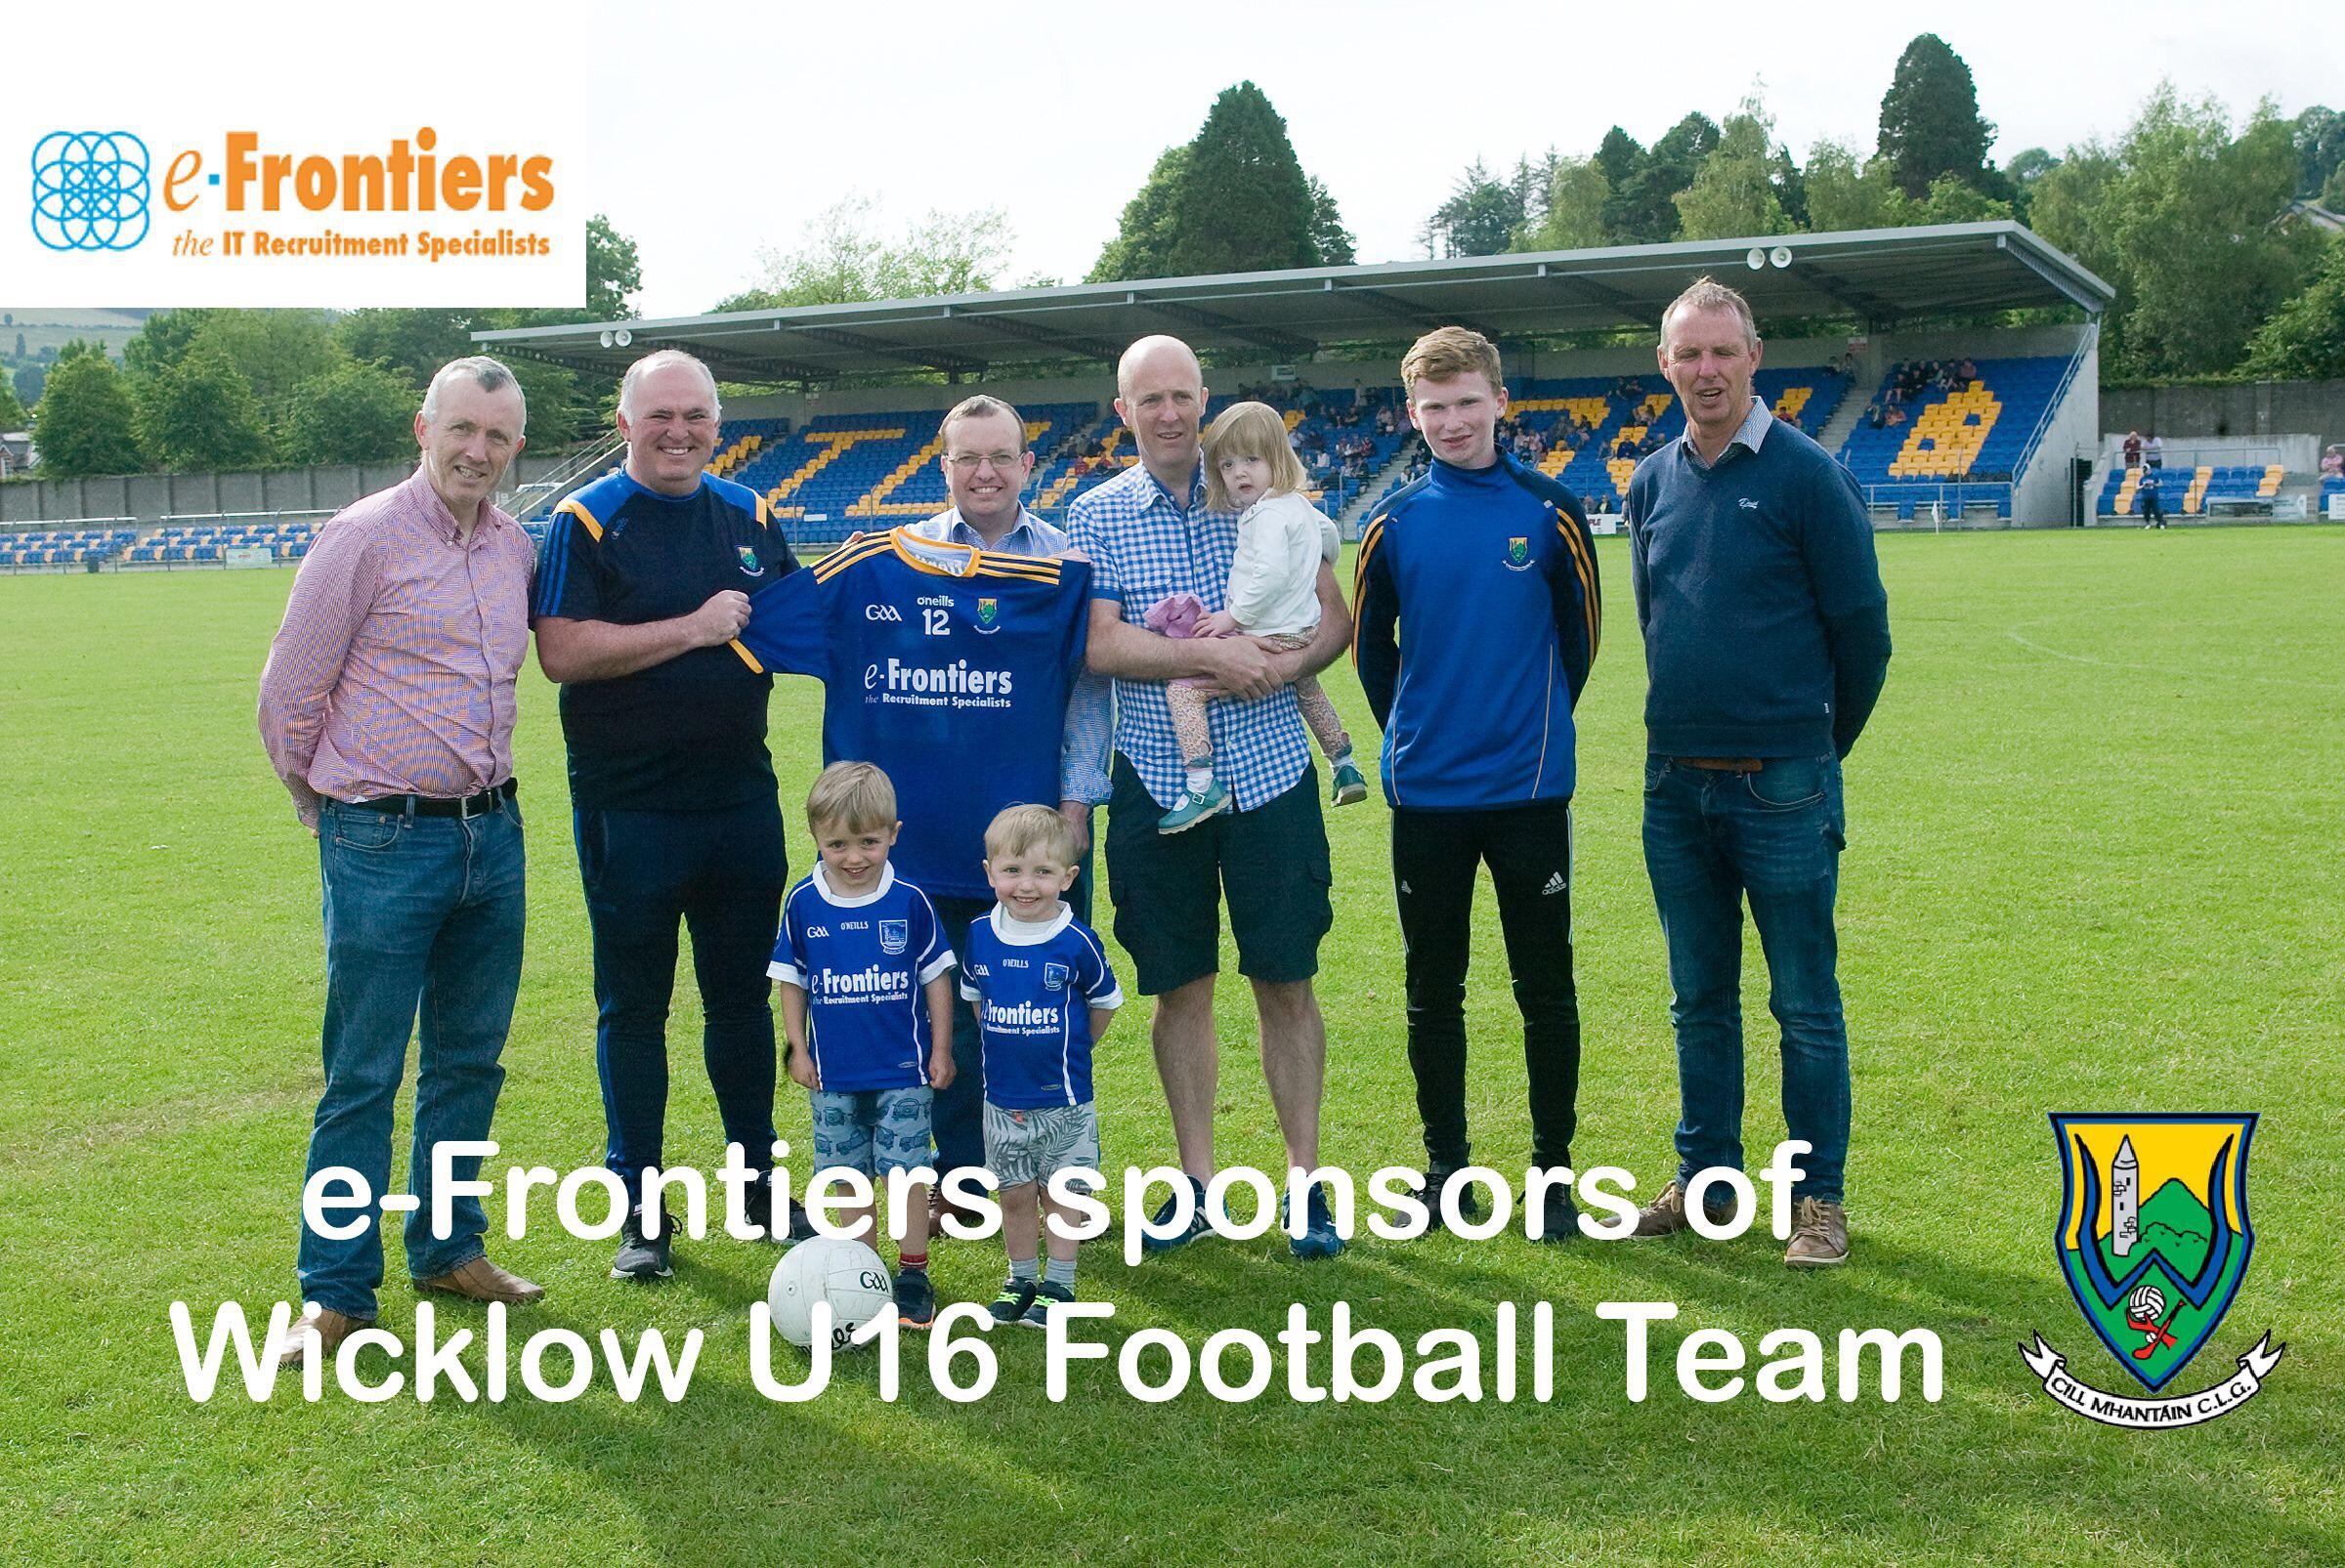 2eadf6c29b7c9f e-Frontiers present jerseys to U16 Football team